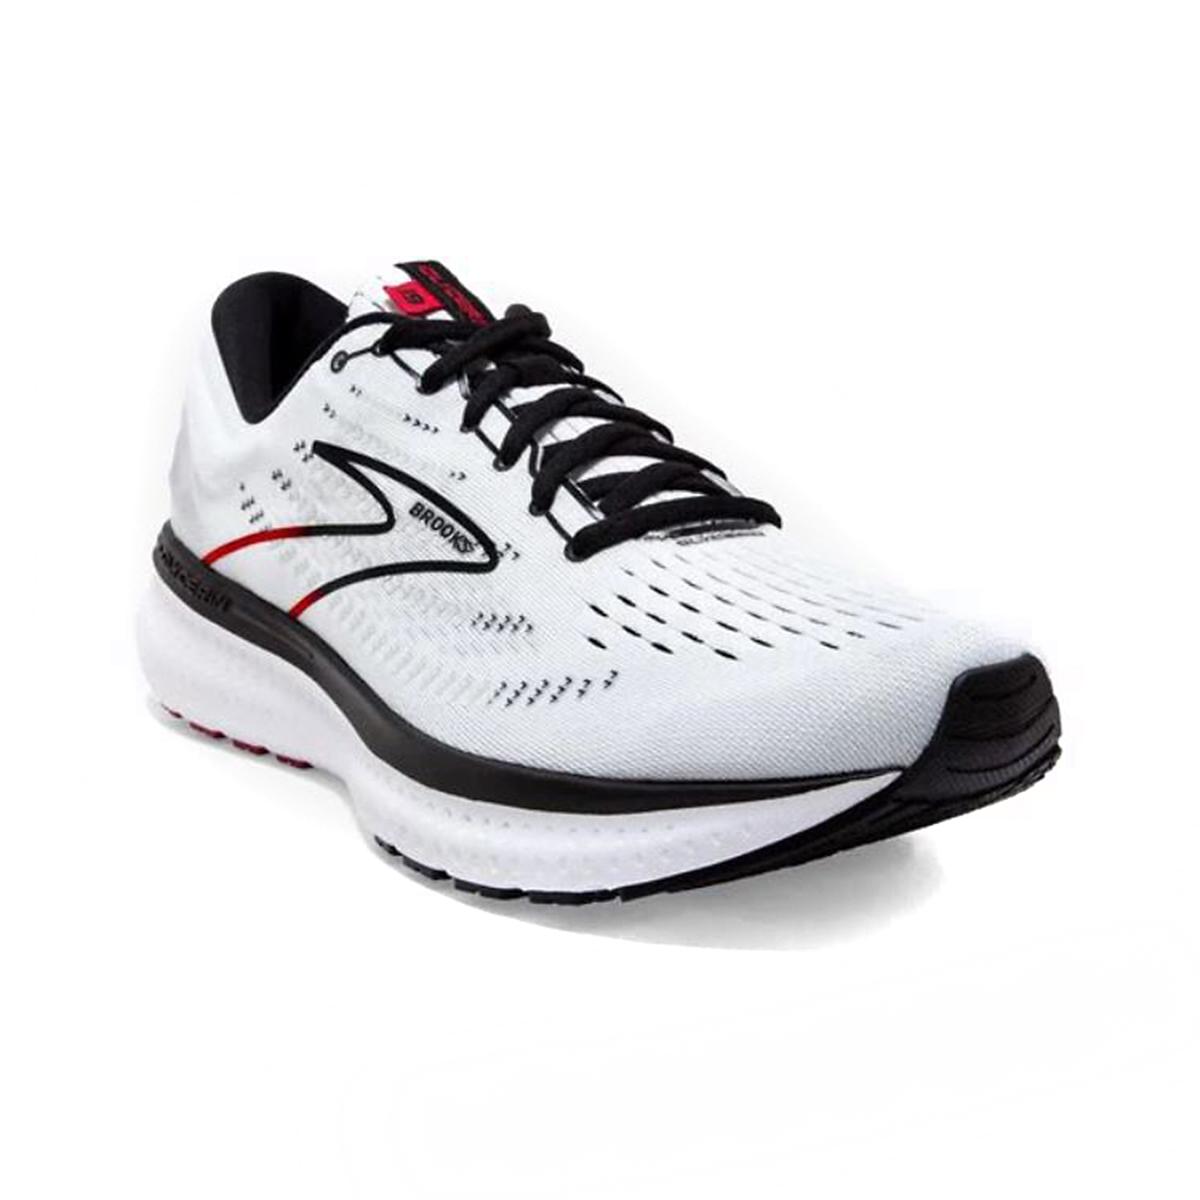 Men's Brooks Glycerin 19 Running Shoe - Color: White/Black/Red - Size: 7 - Width: Regular, White/Black/Red, large, image 3